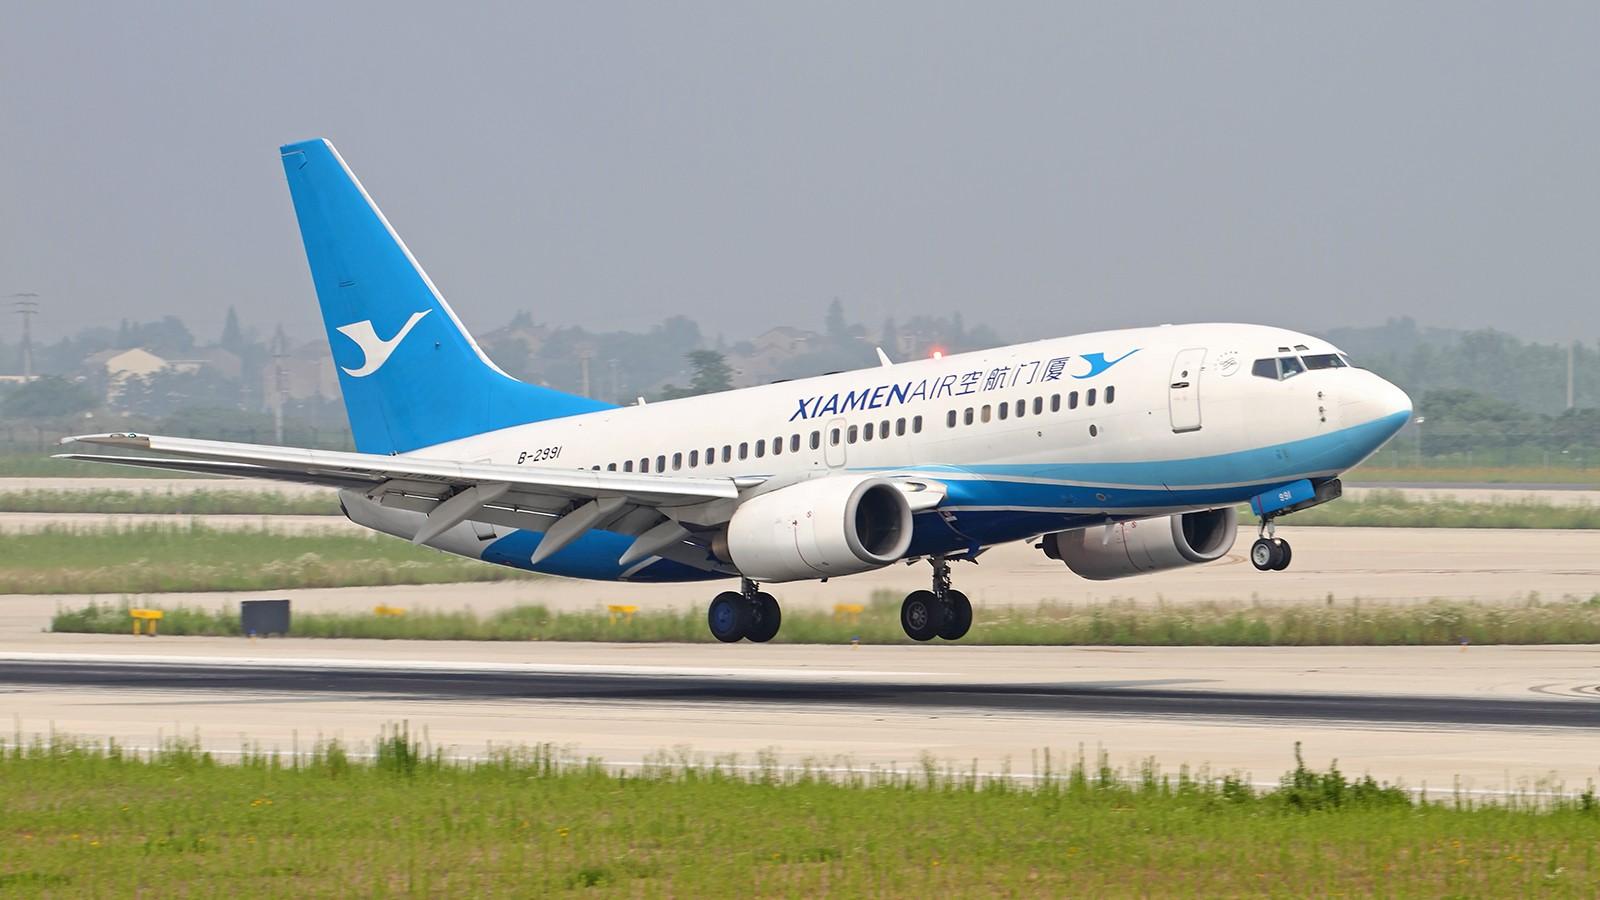 Re:[原创]端午节去拍了半小时就被领导夺命追魂call了~ BOEING 737-700 B-2991 中国南京禄口国际机场